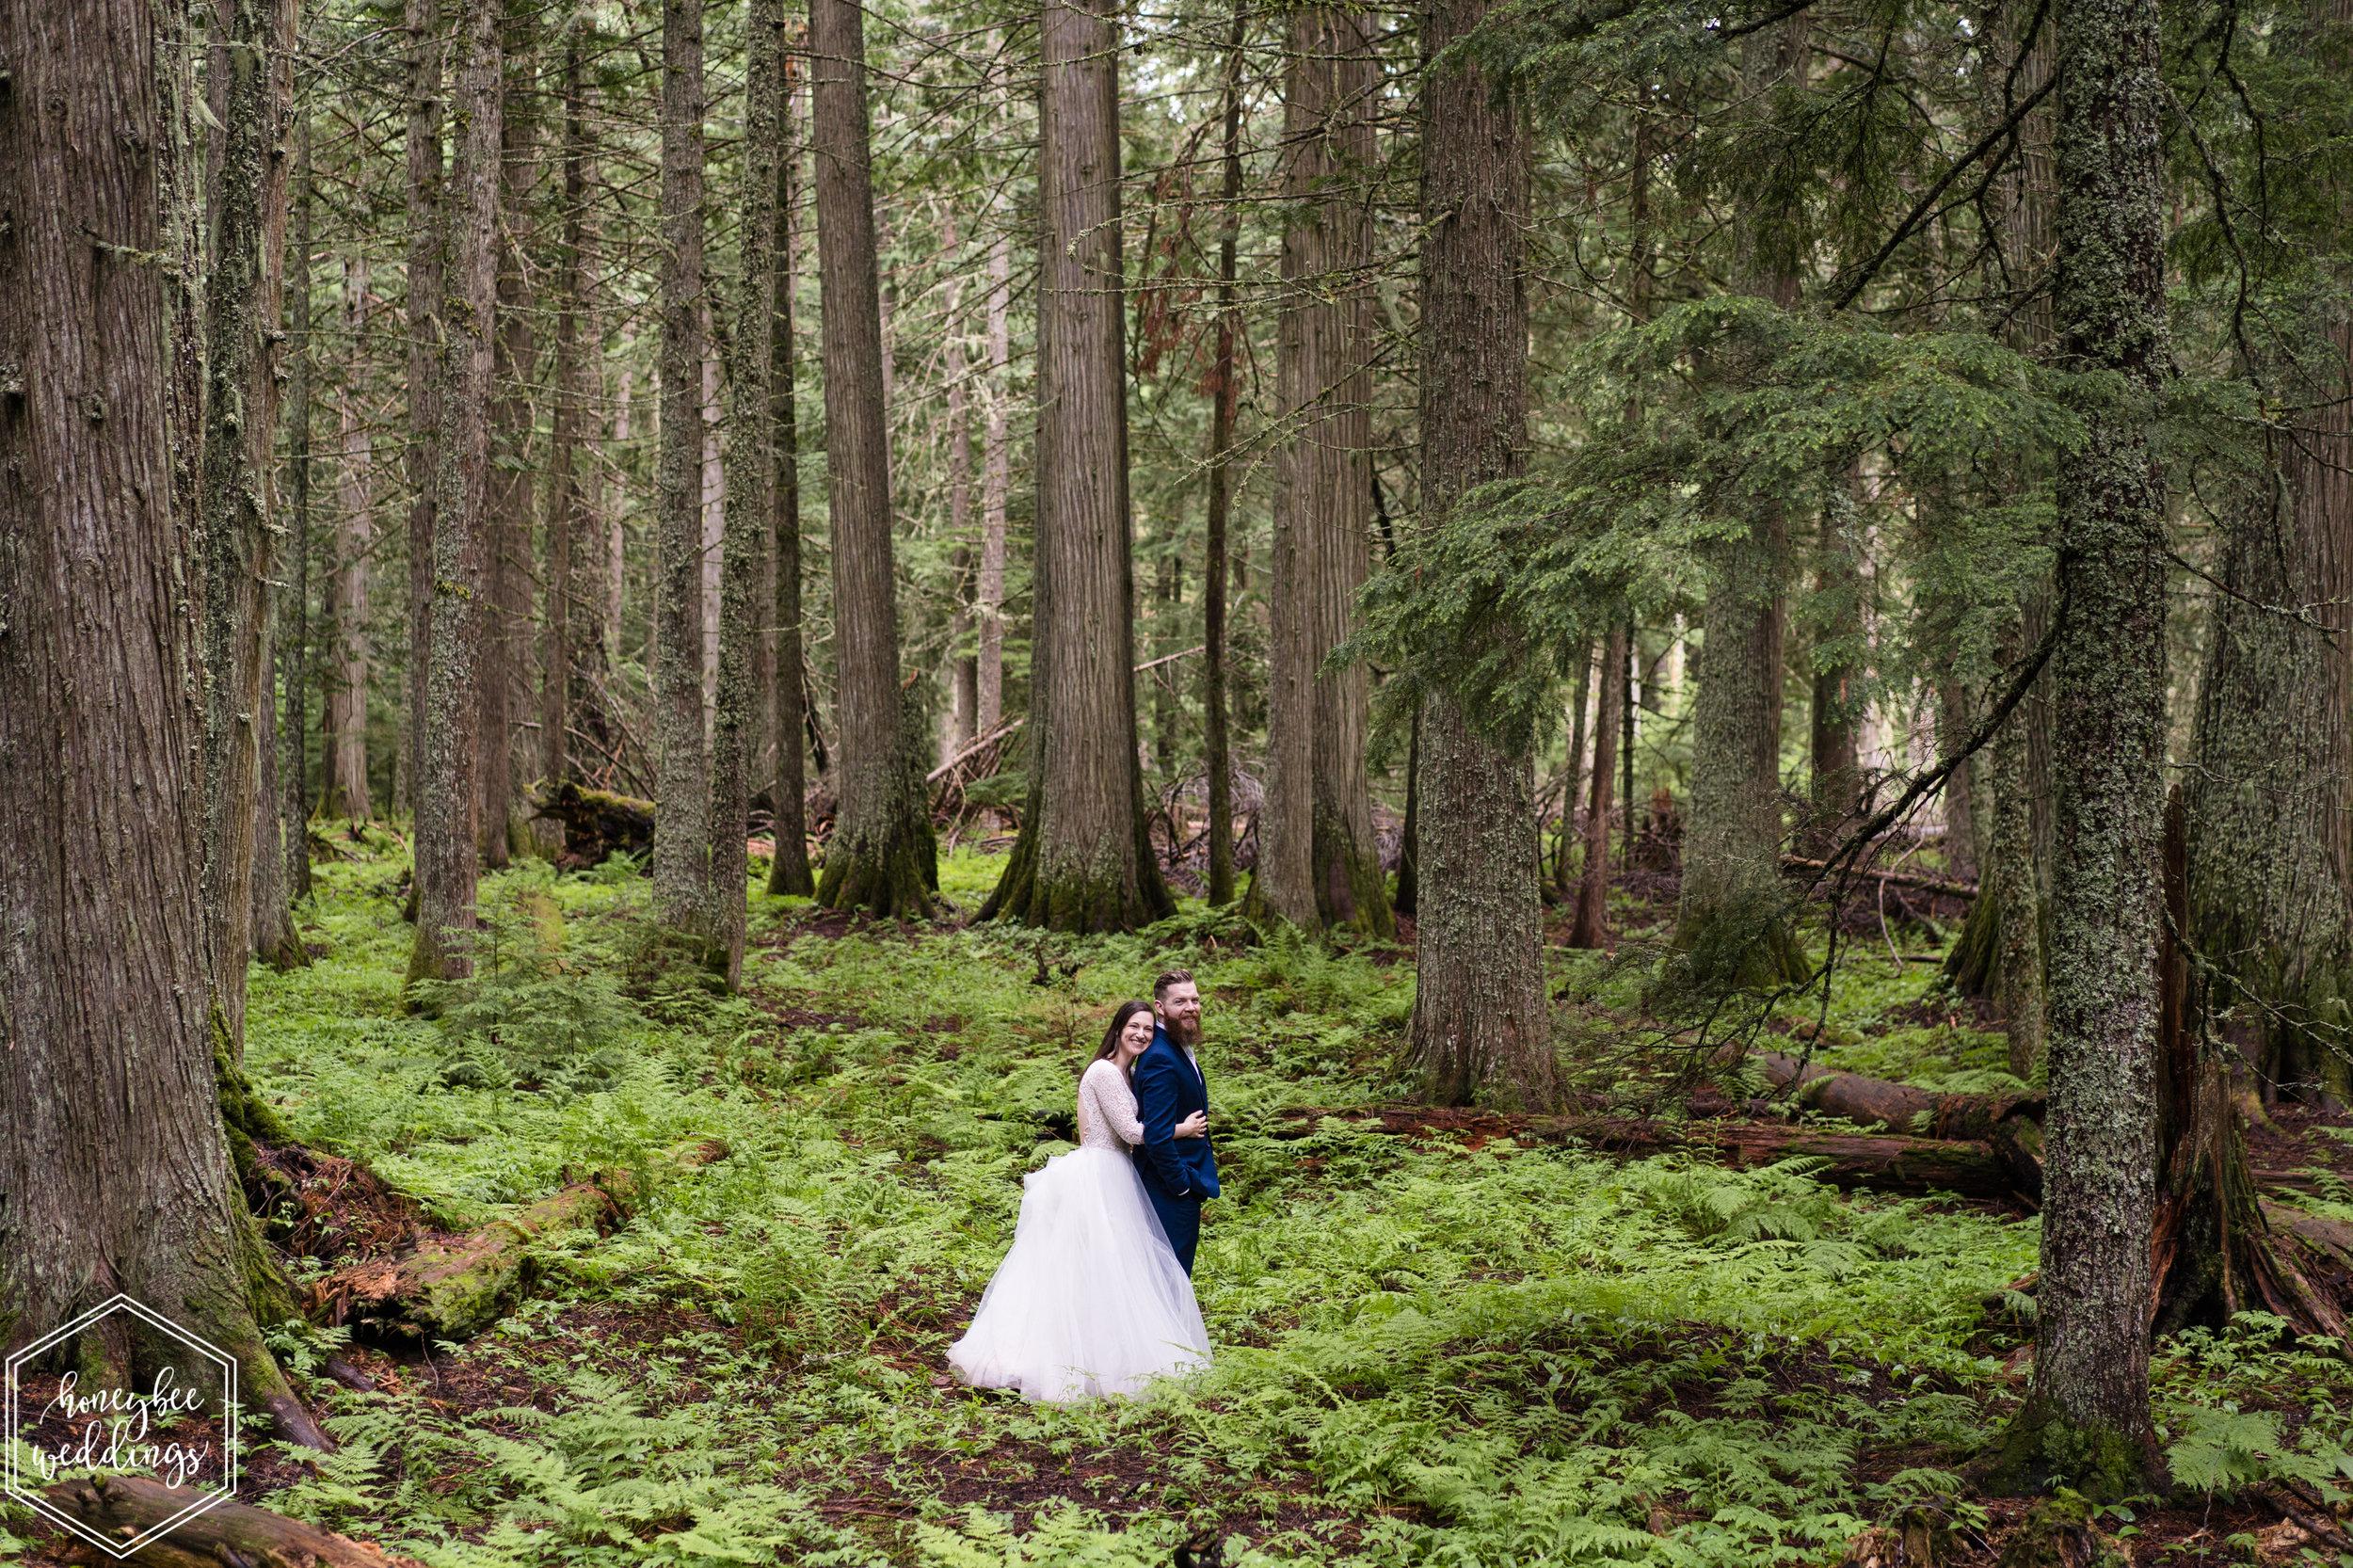 305Glacier National Park Wedding_Izaak Walton Inn Wedding_Honeybee Weddings_Norah & Kyle_June 09, 2019-180.jpg